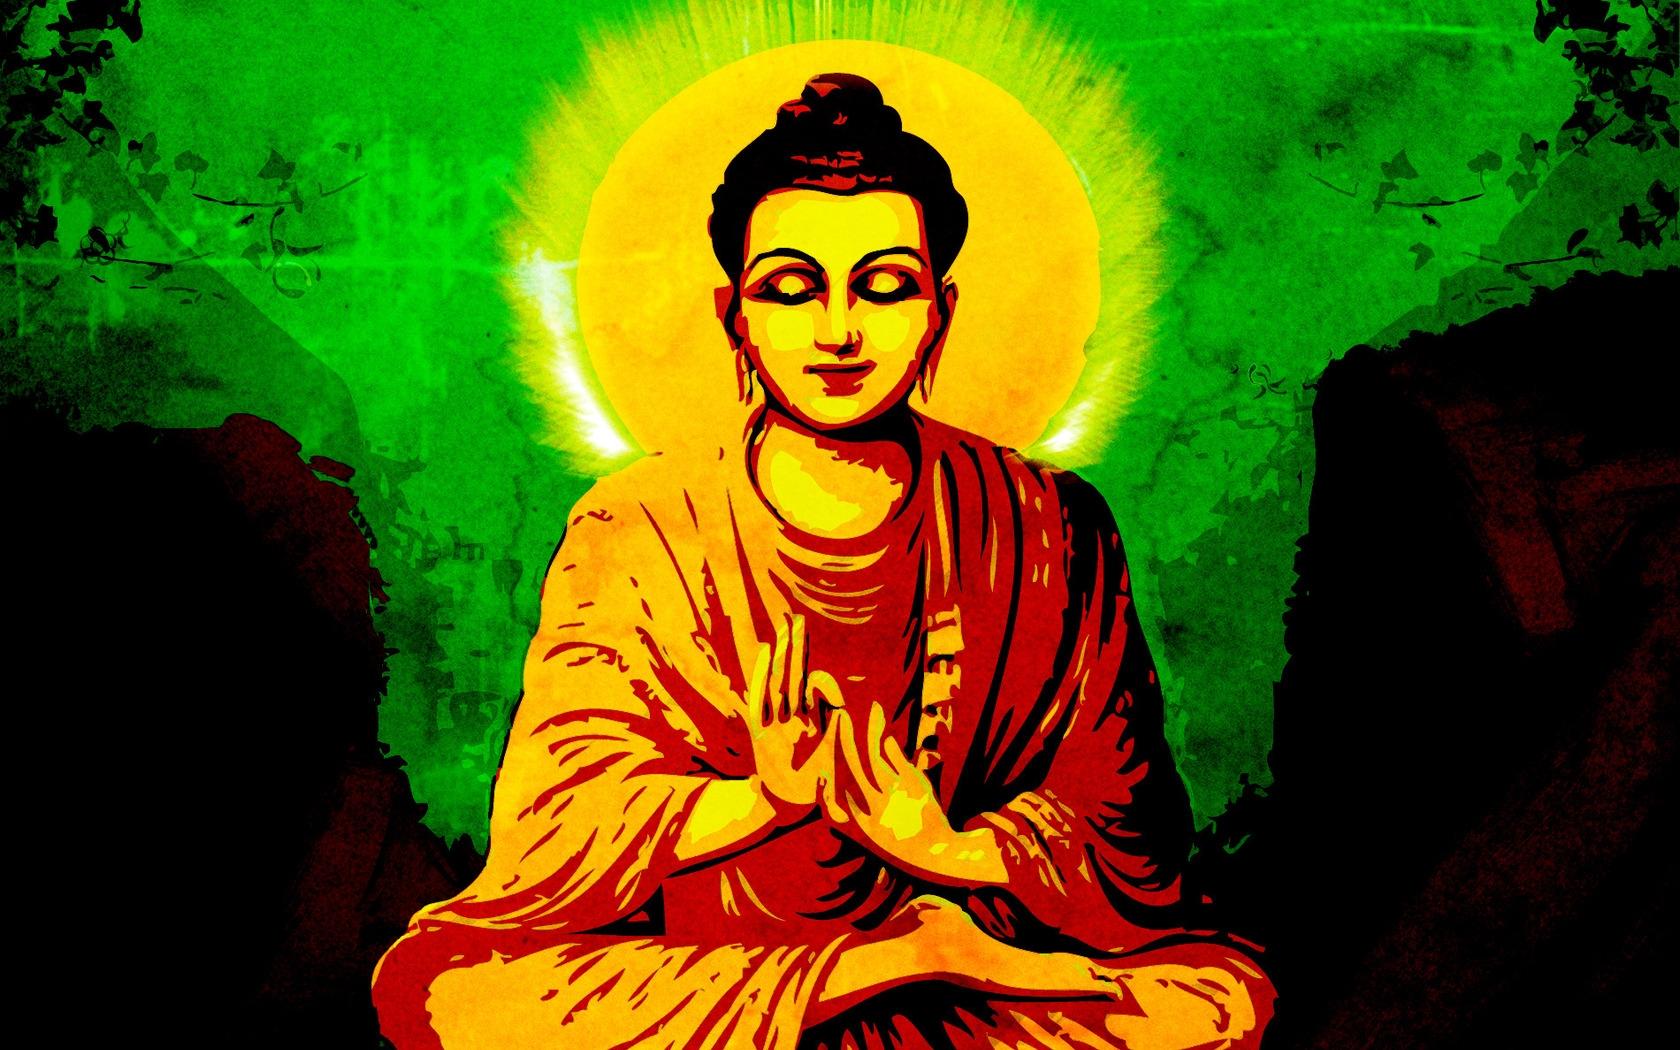 Lord Buddha 3d Live Wallpaper Buddha Wallpaper Images A29 Hd Desktop Wallpapers 4k Hd